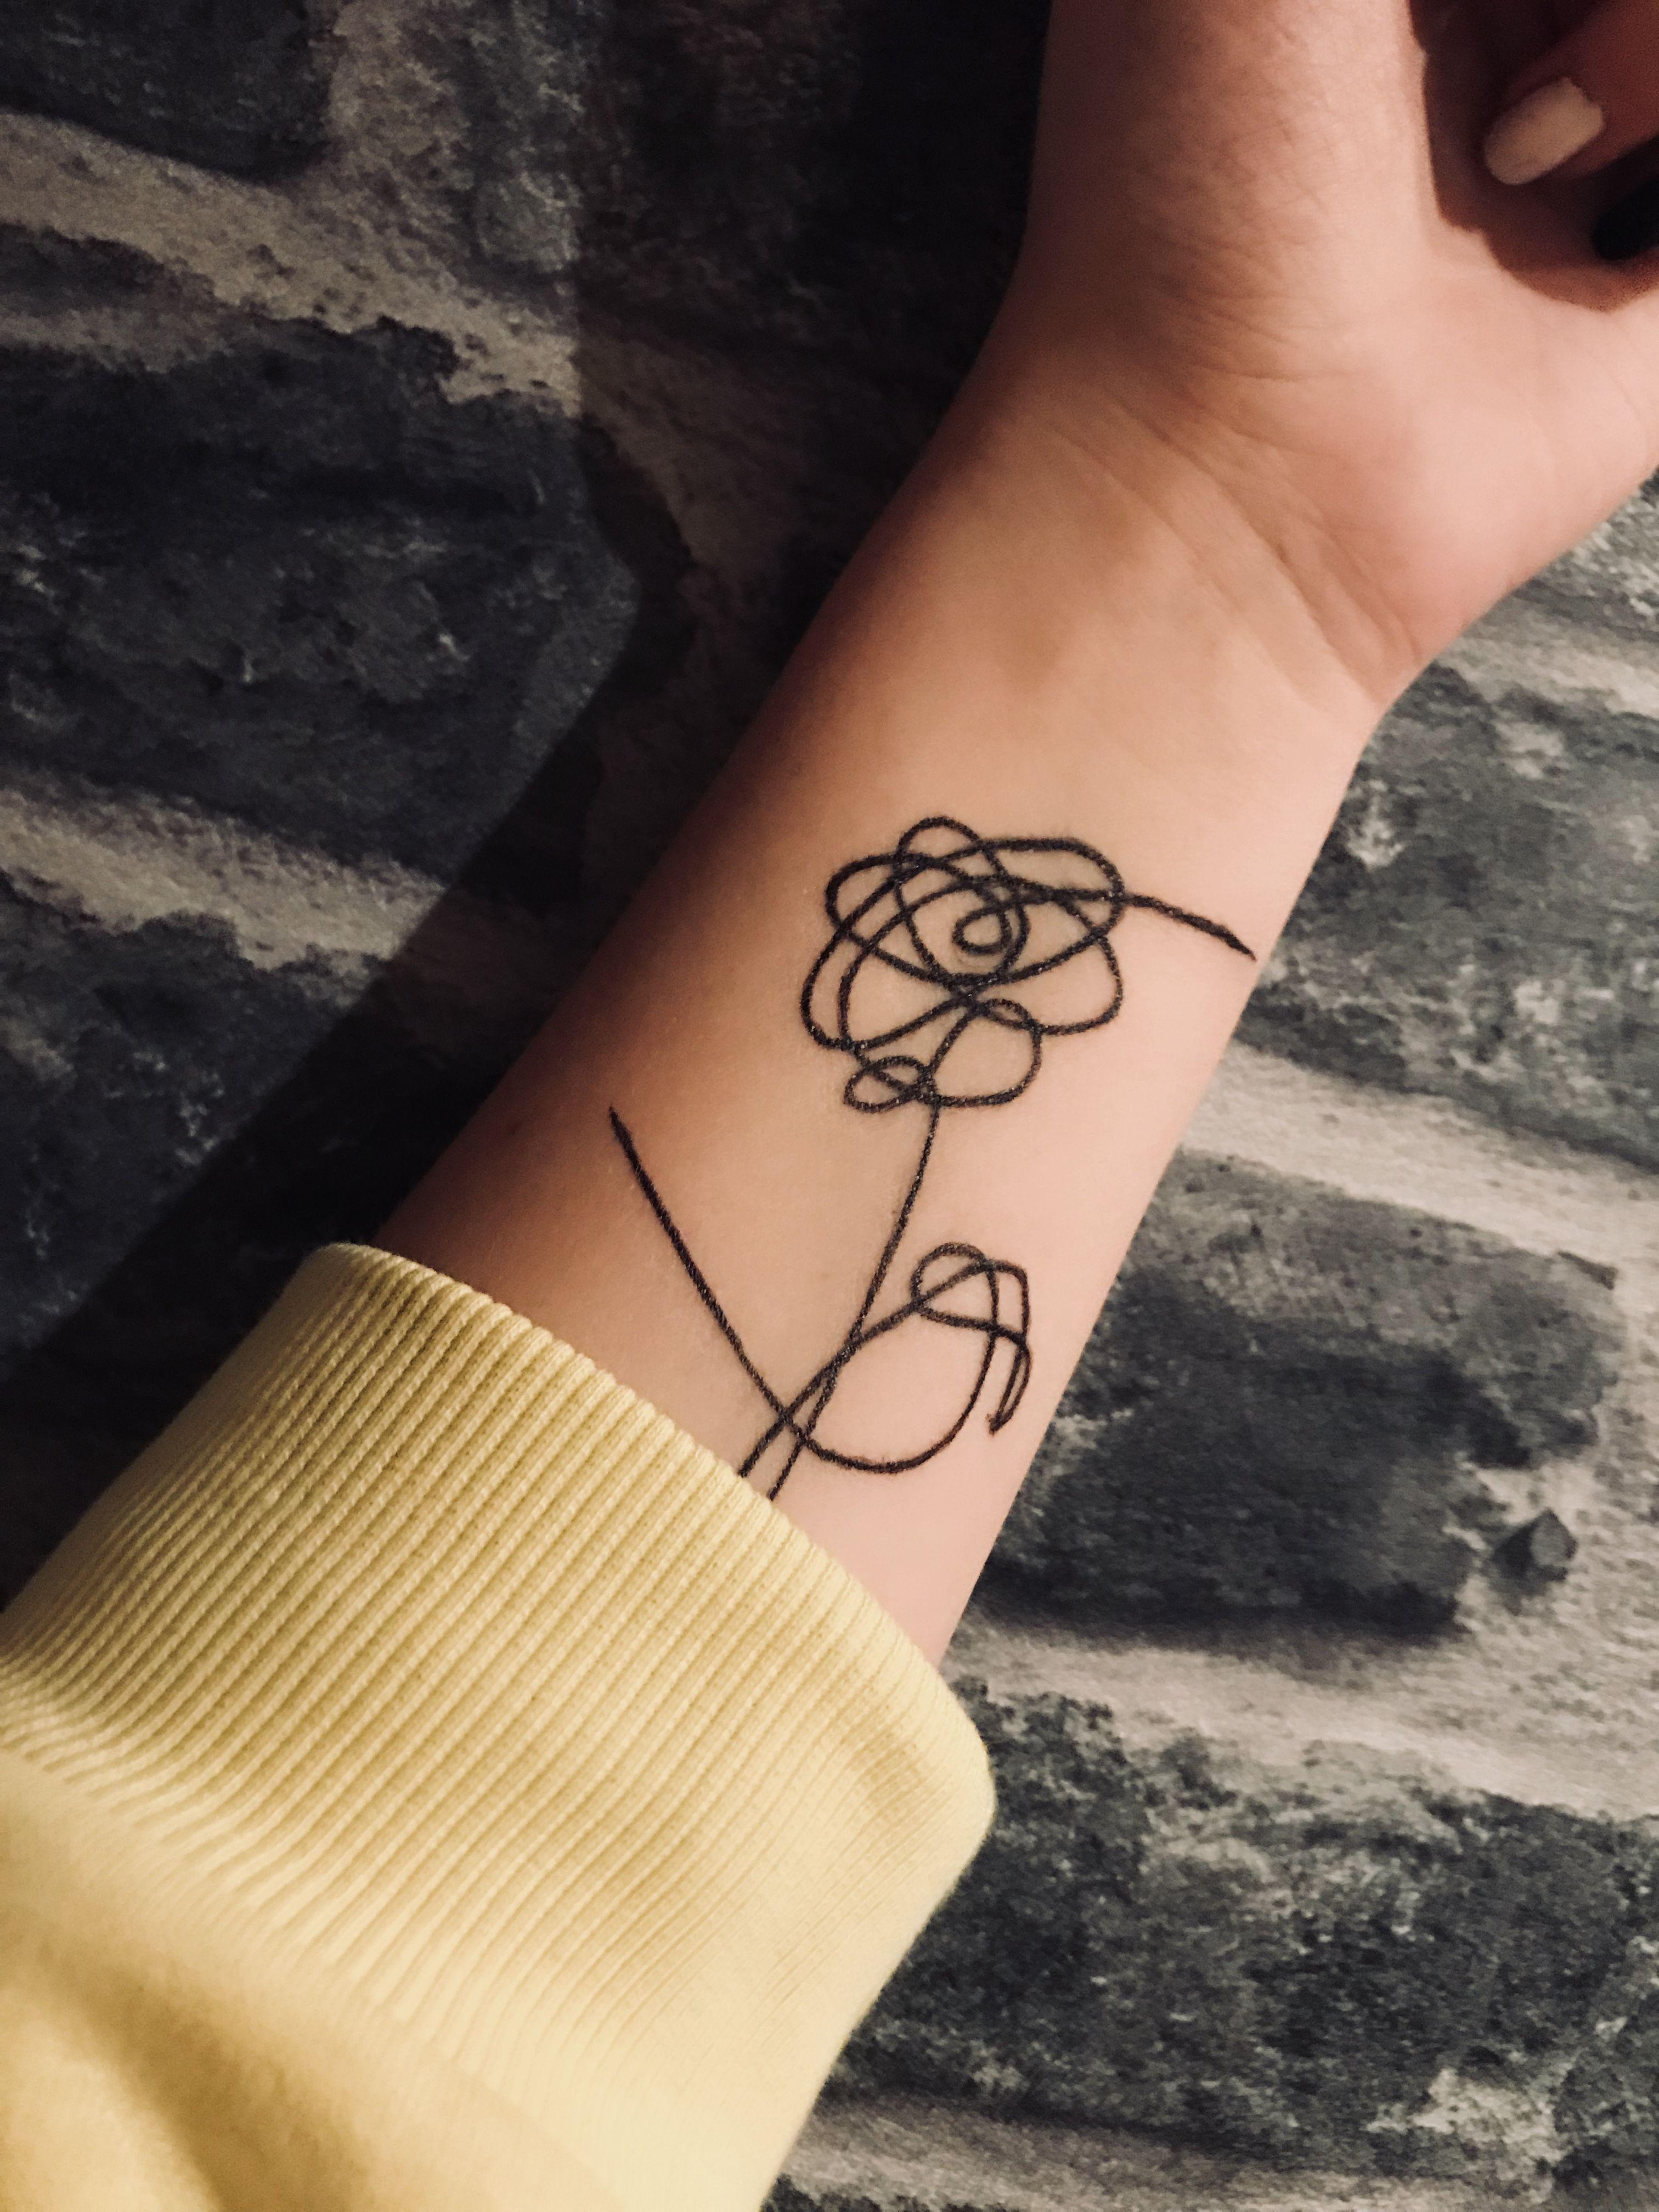 Pin by Katarina Jeftic on Symbols Bts tattoos, Kpop